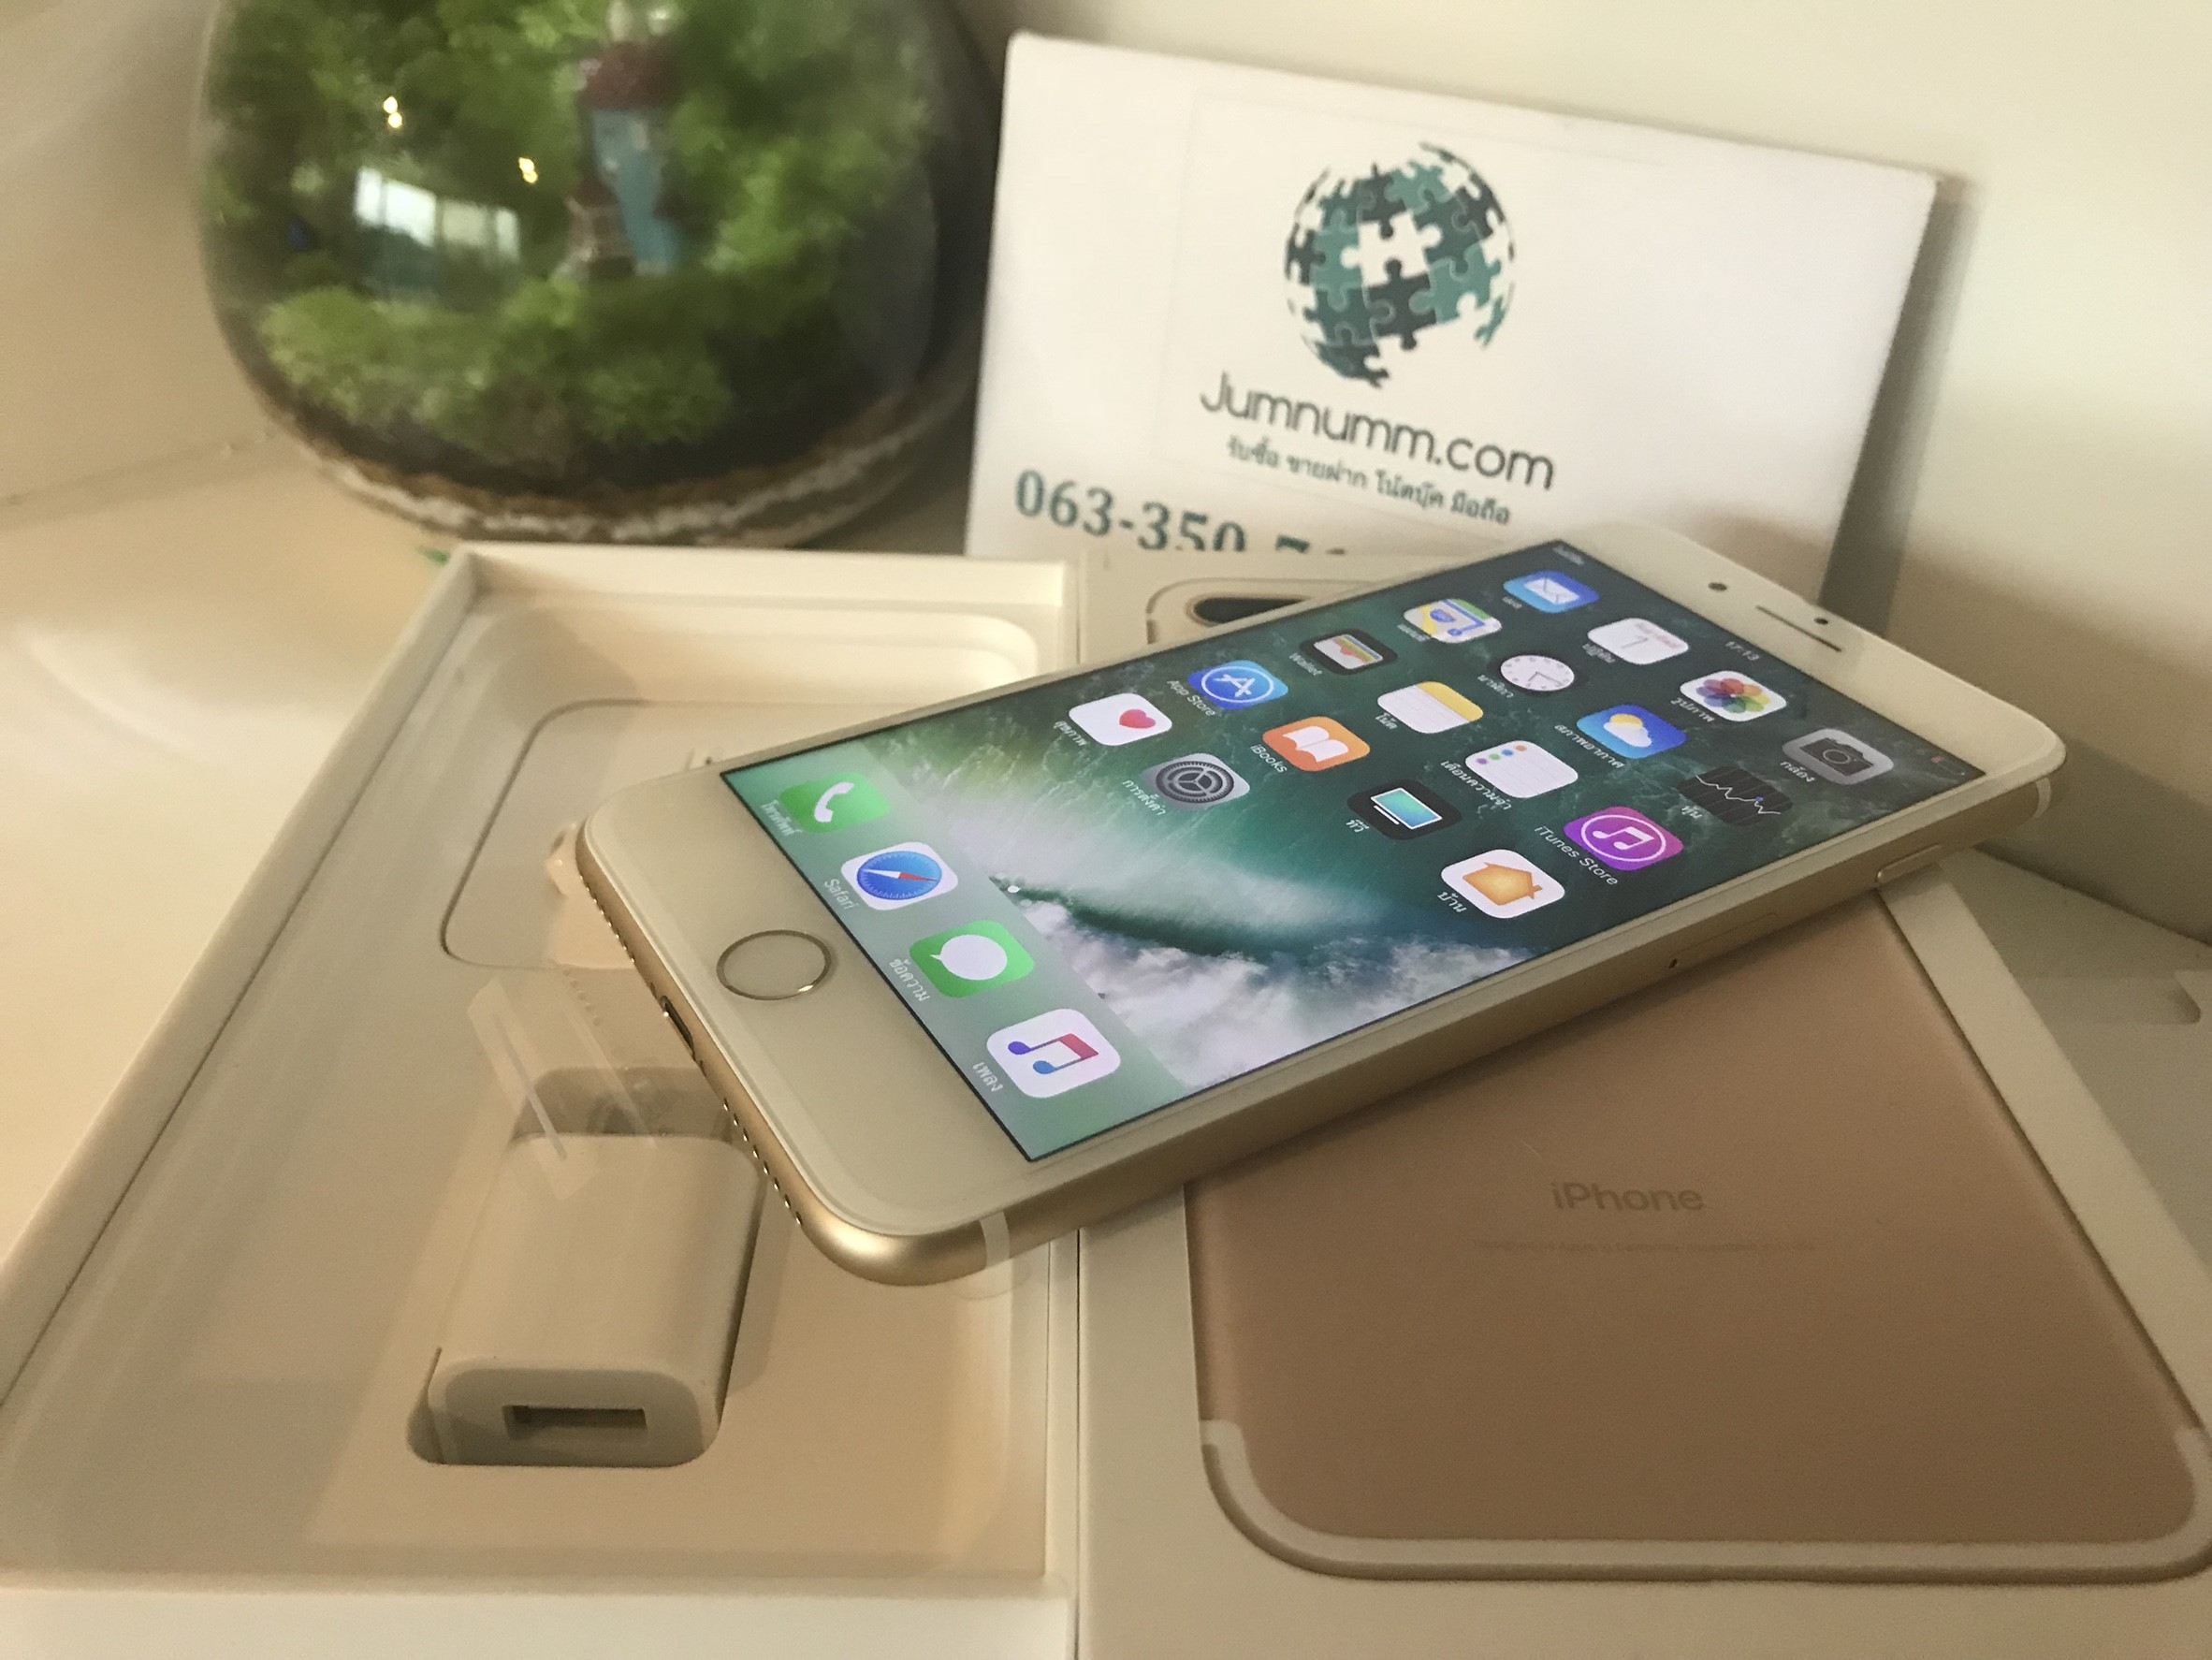 JMM-91 IPhone7 plus 256Gb Gold ประกันหมด เม.ย 61